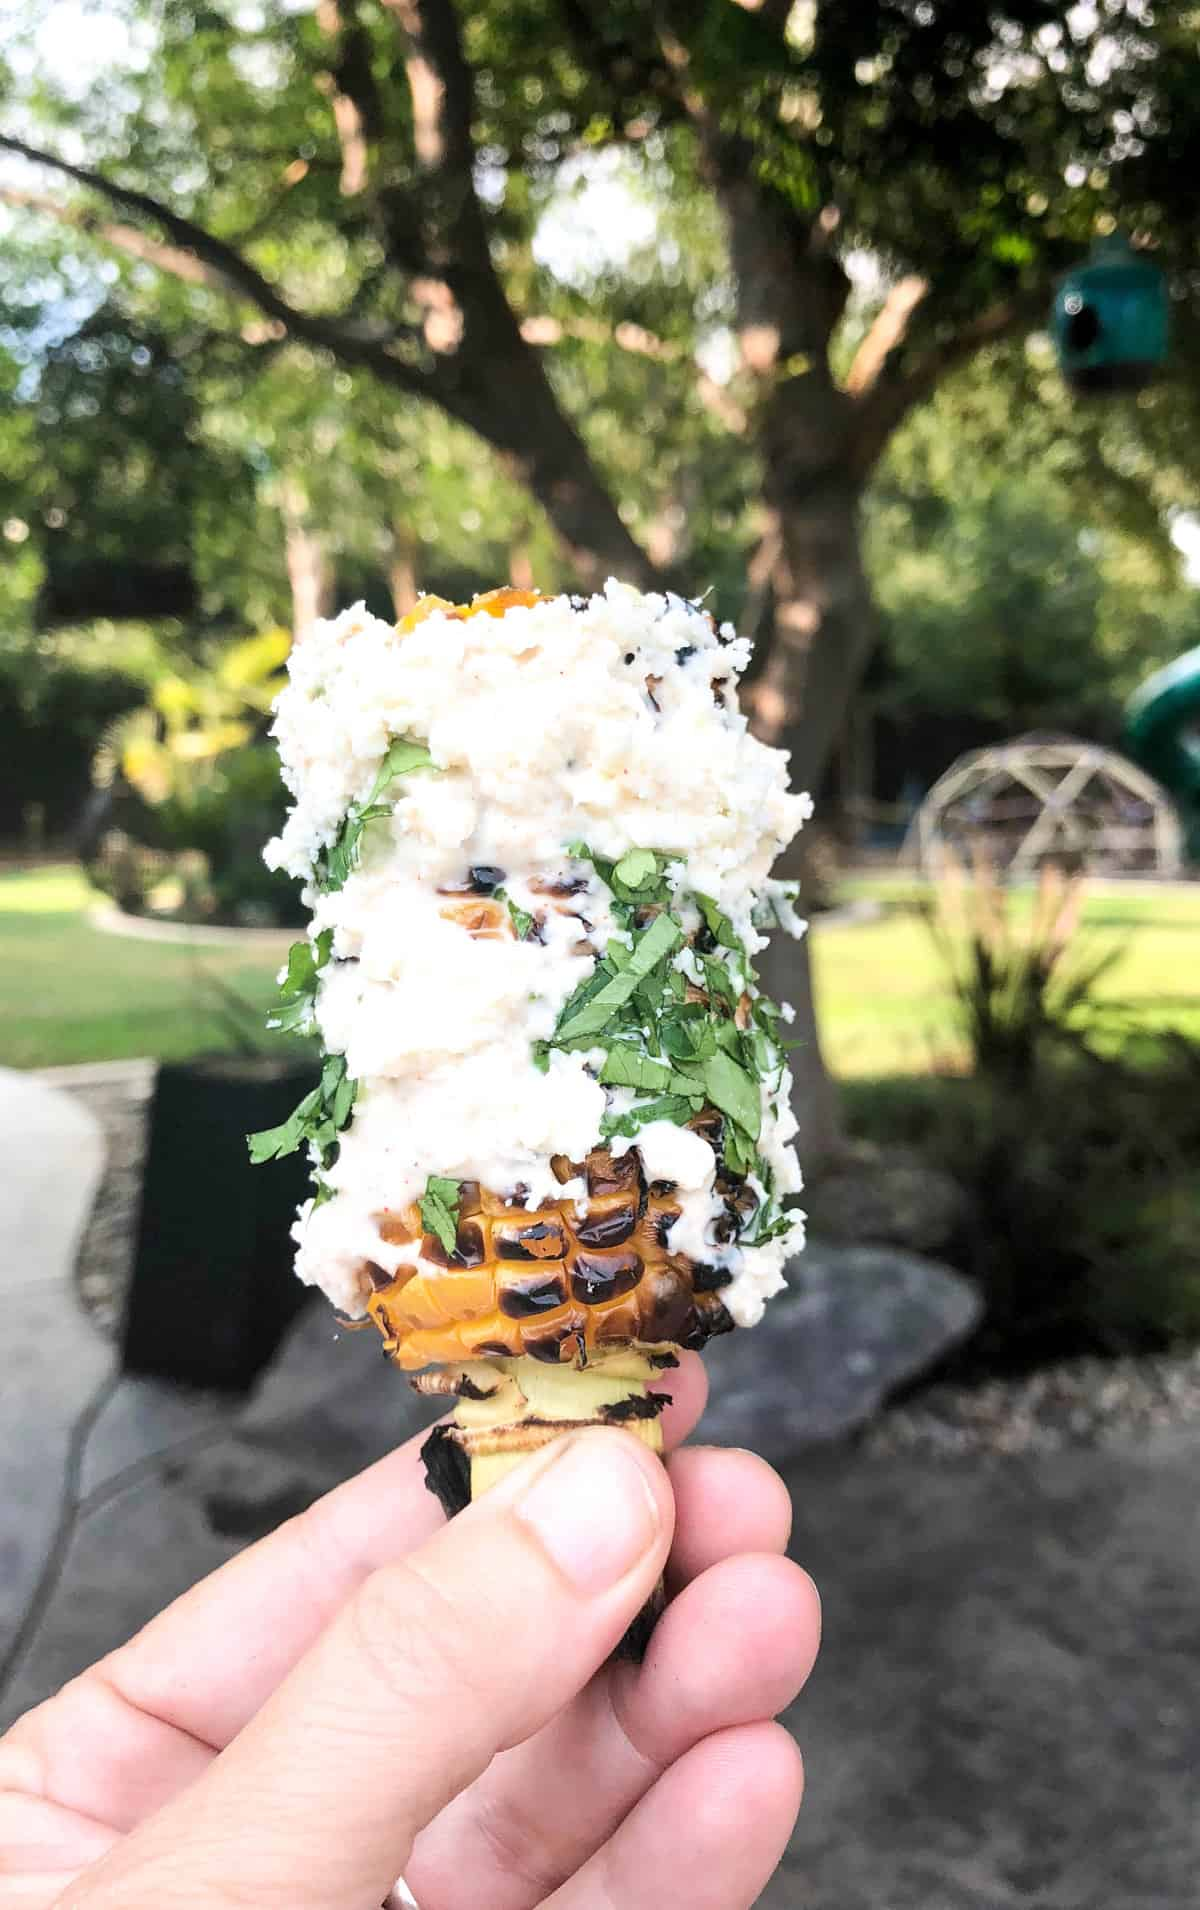 Street Corn! California style!